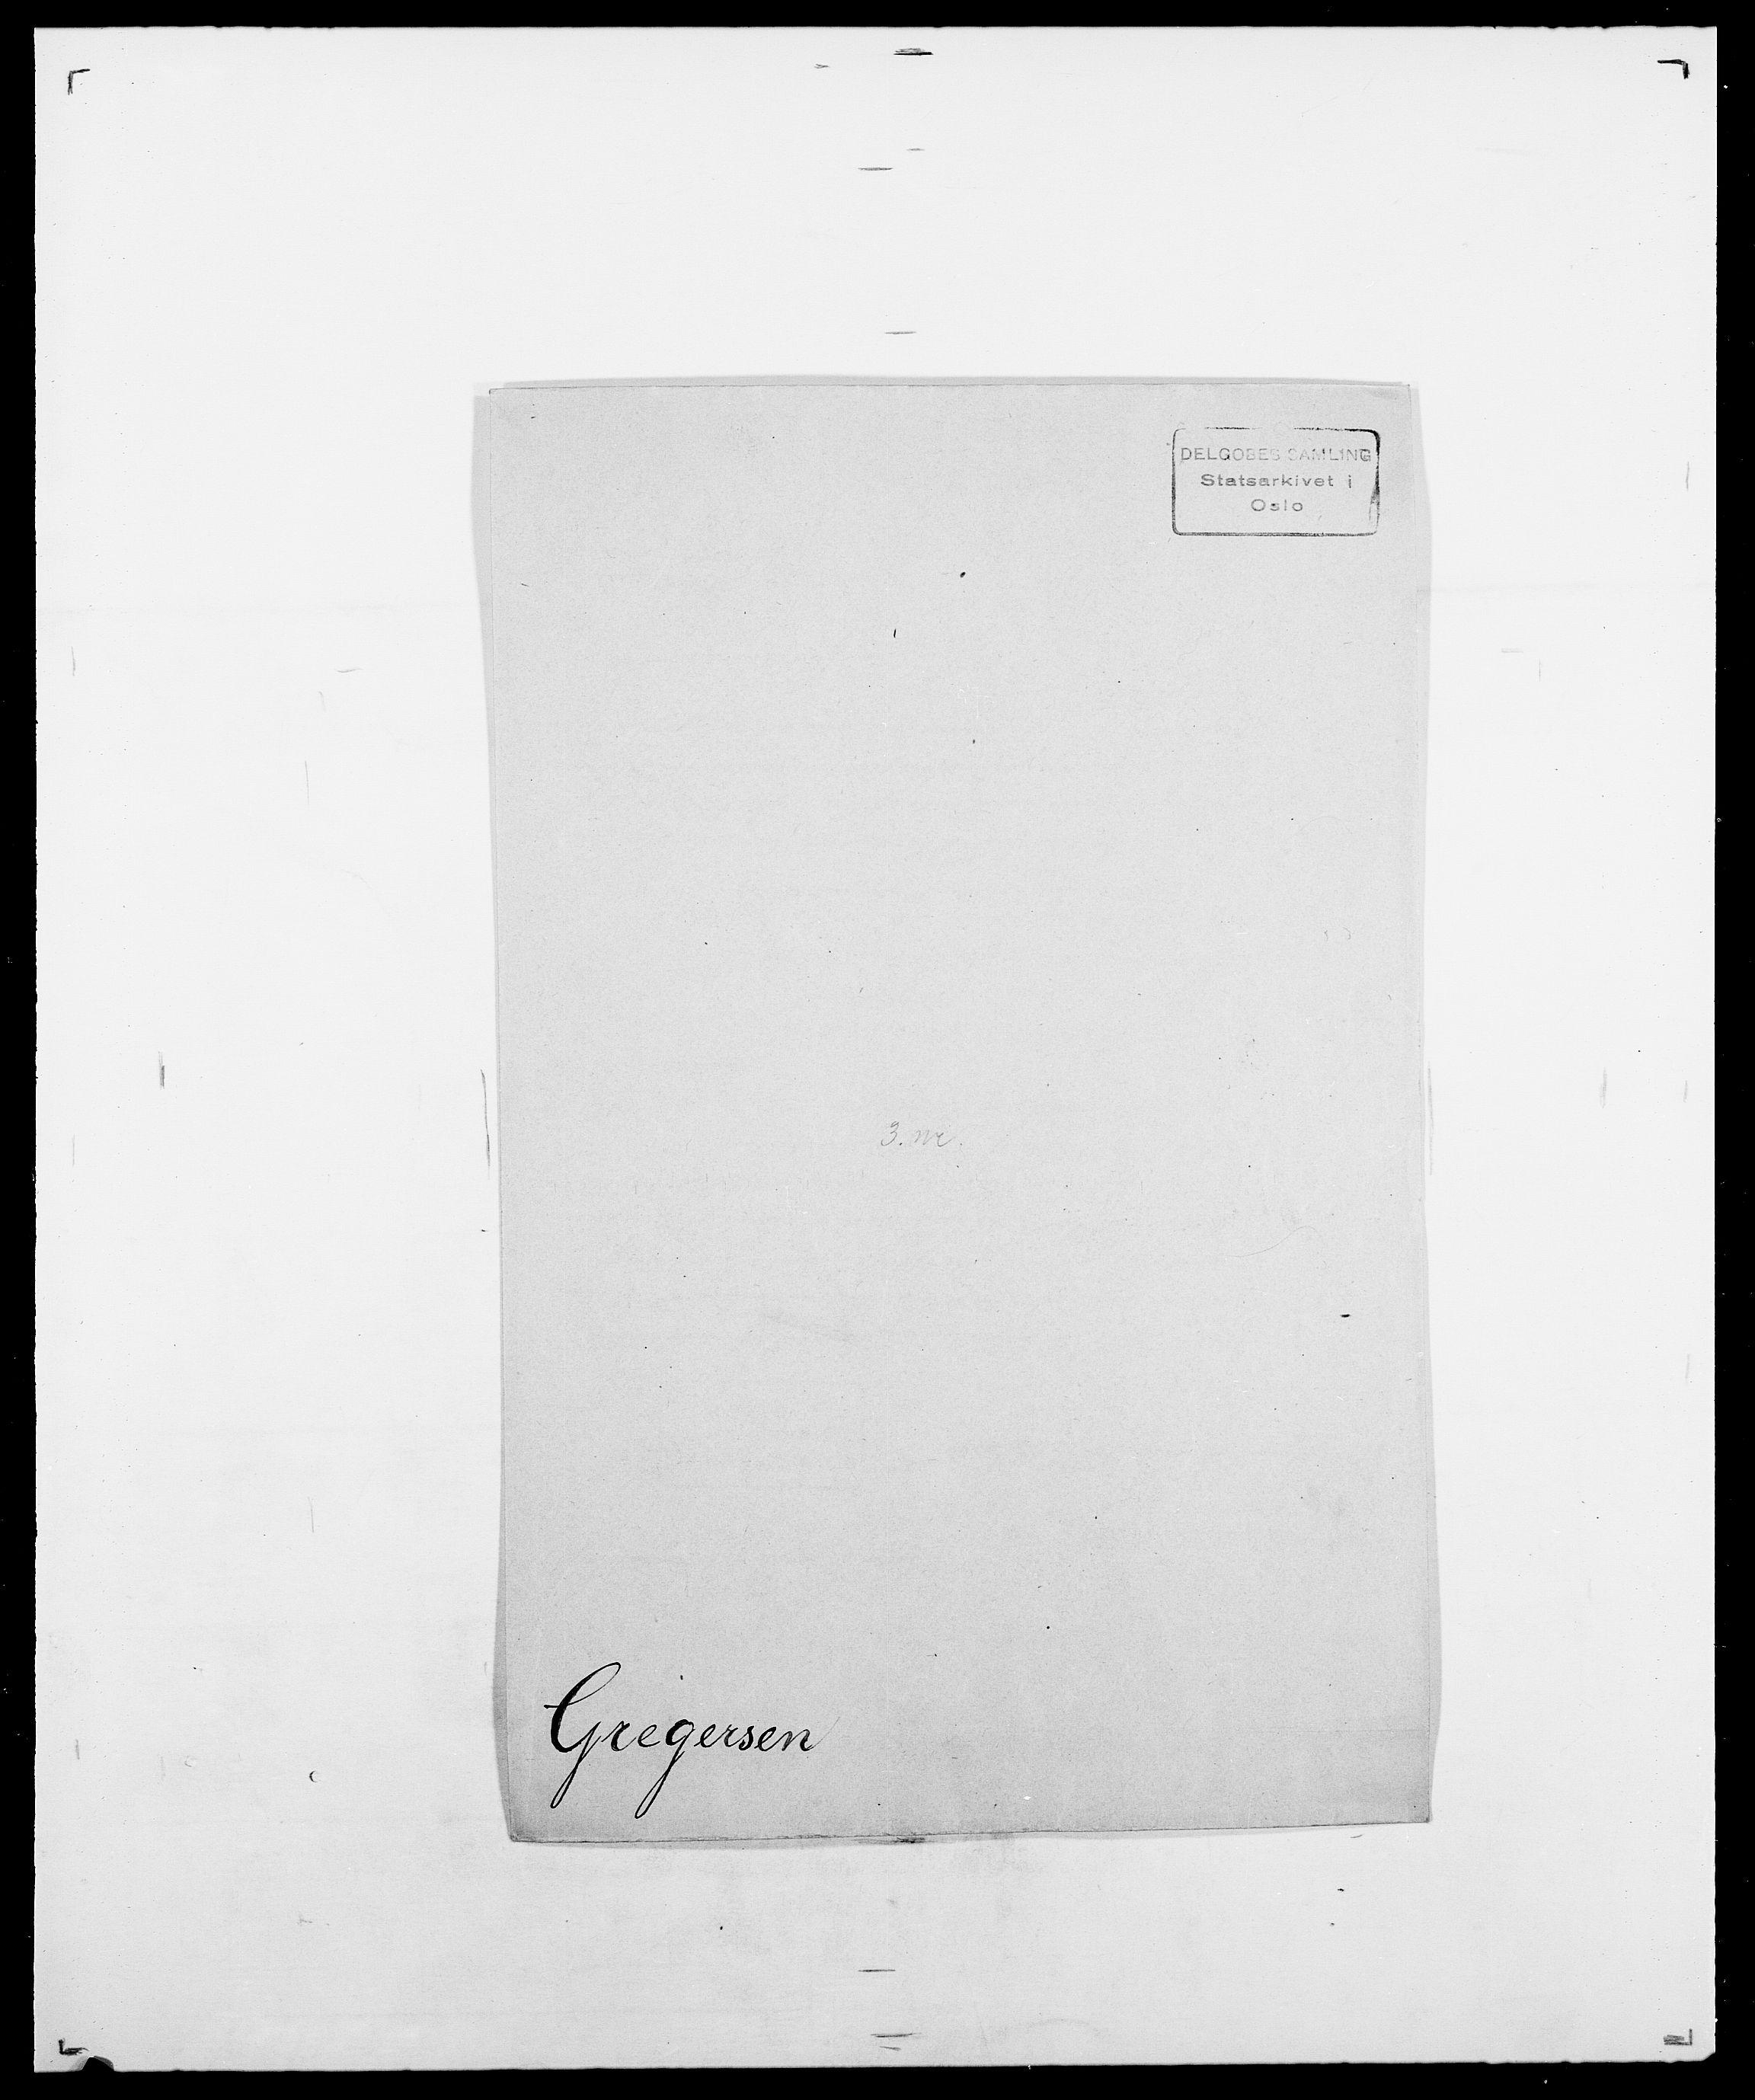 SAO, Delgobe, Charles Antoine - samling, D/Da/L0014: Giebdhausen - Grip, s. 595